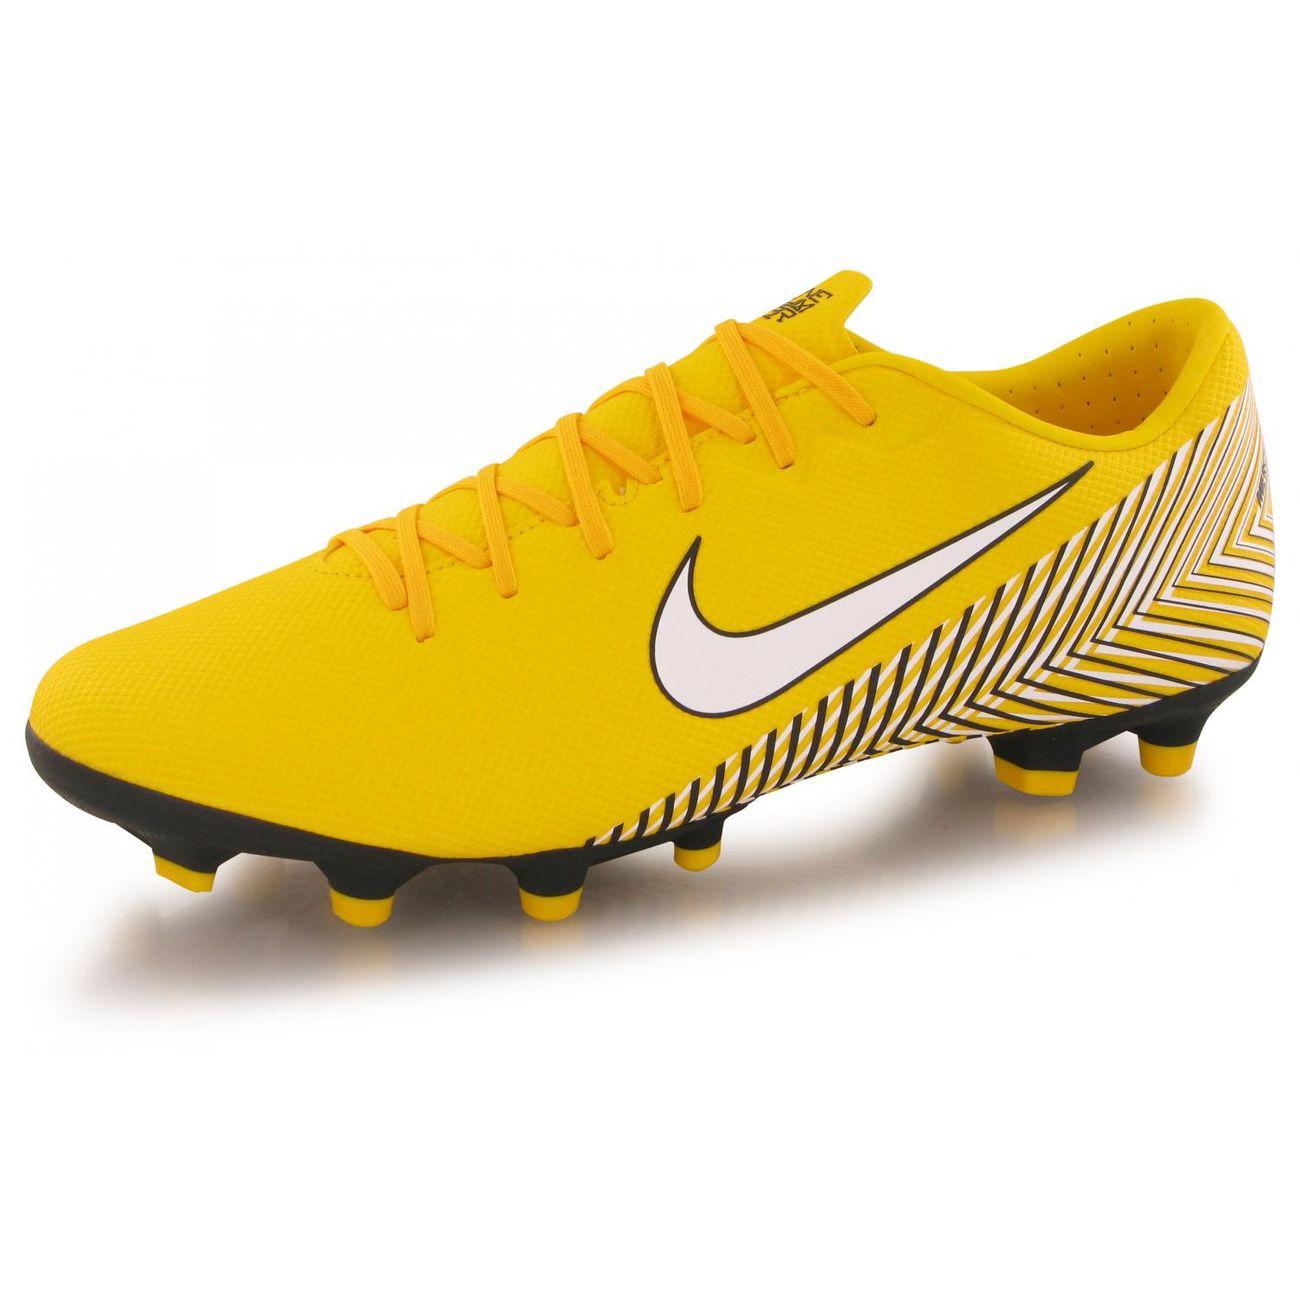 Homme Jr 12 Neymar Academy Nike Chaussures Vapor Football Mg PkuXiZ